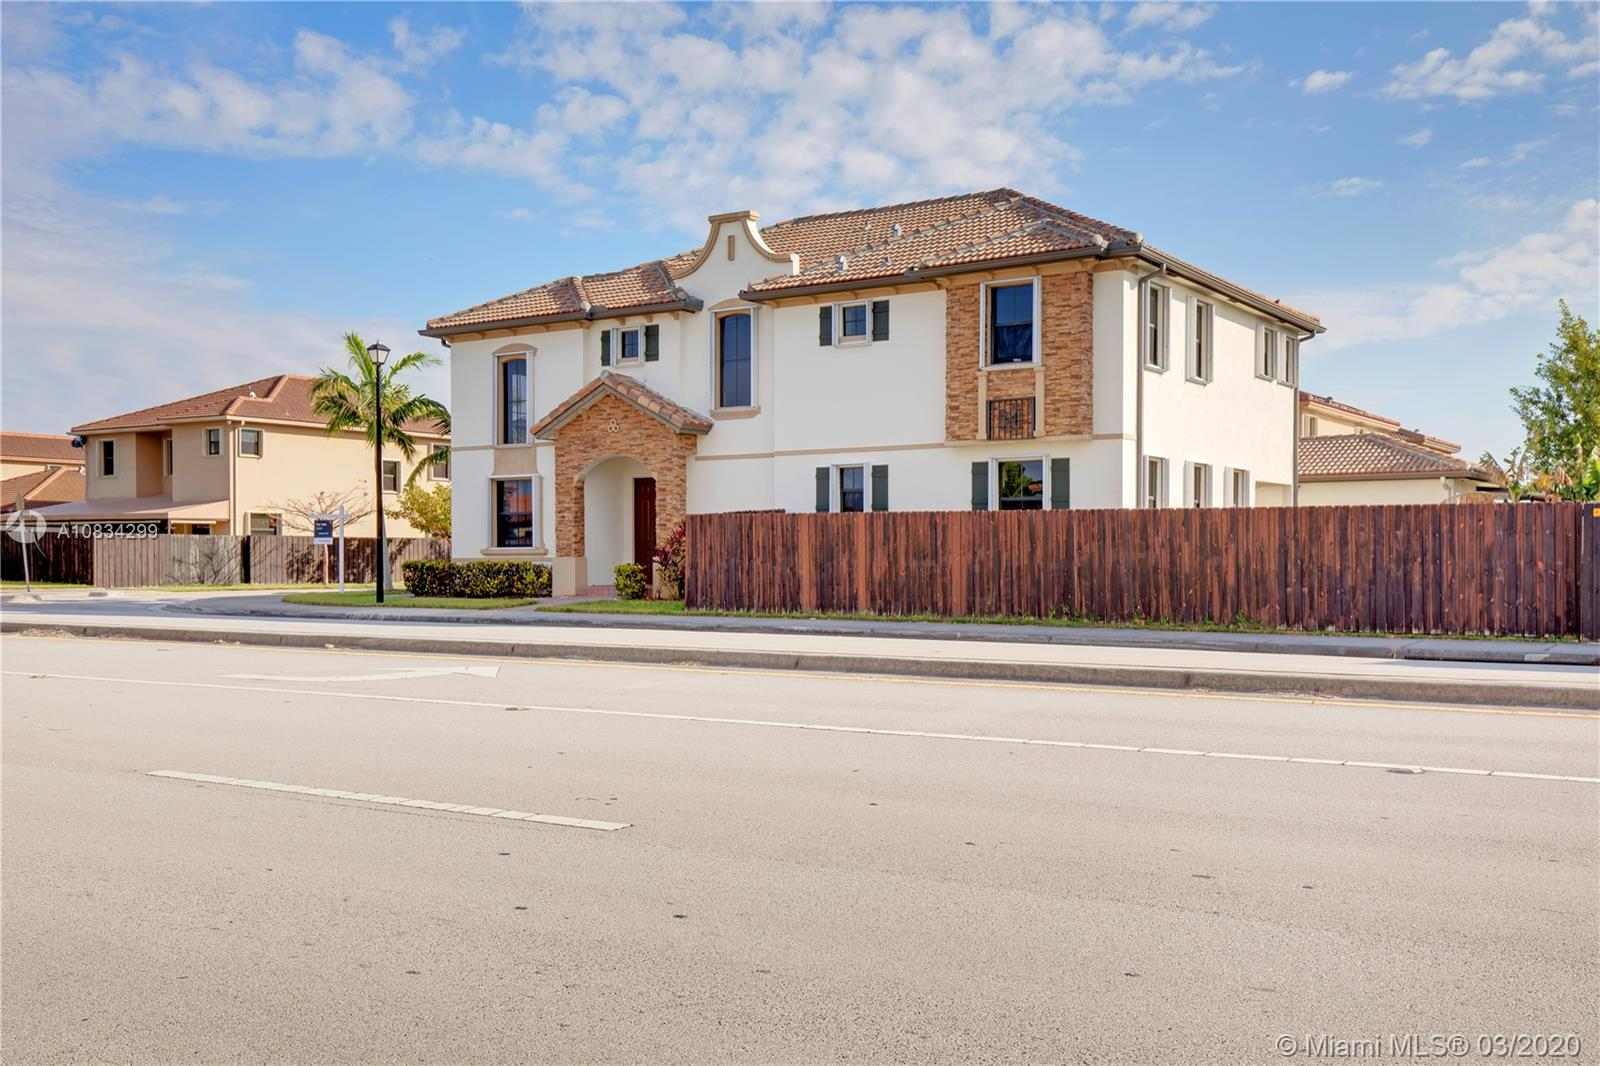 11644 SW 233rd Ln Property Photo